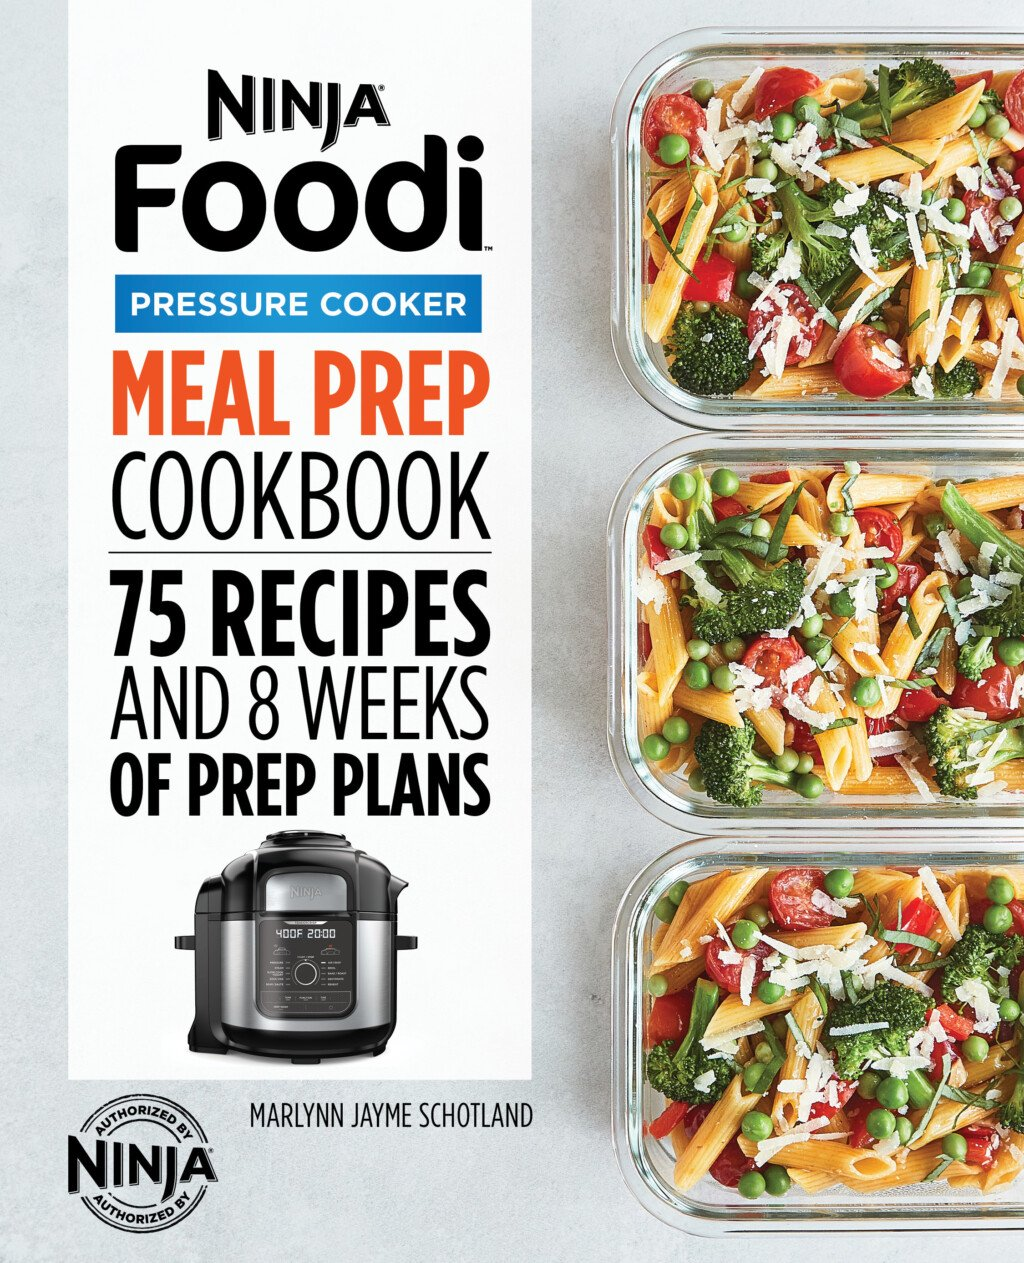 cover of the ninja foodi meal prep cookbook